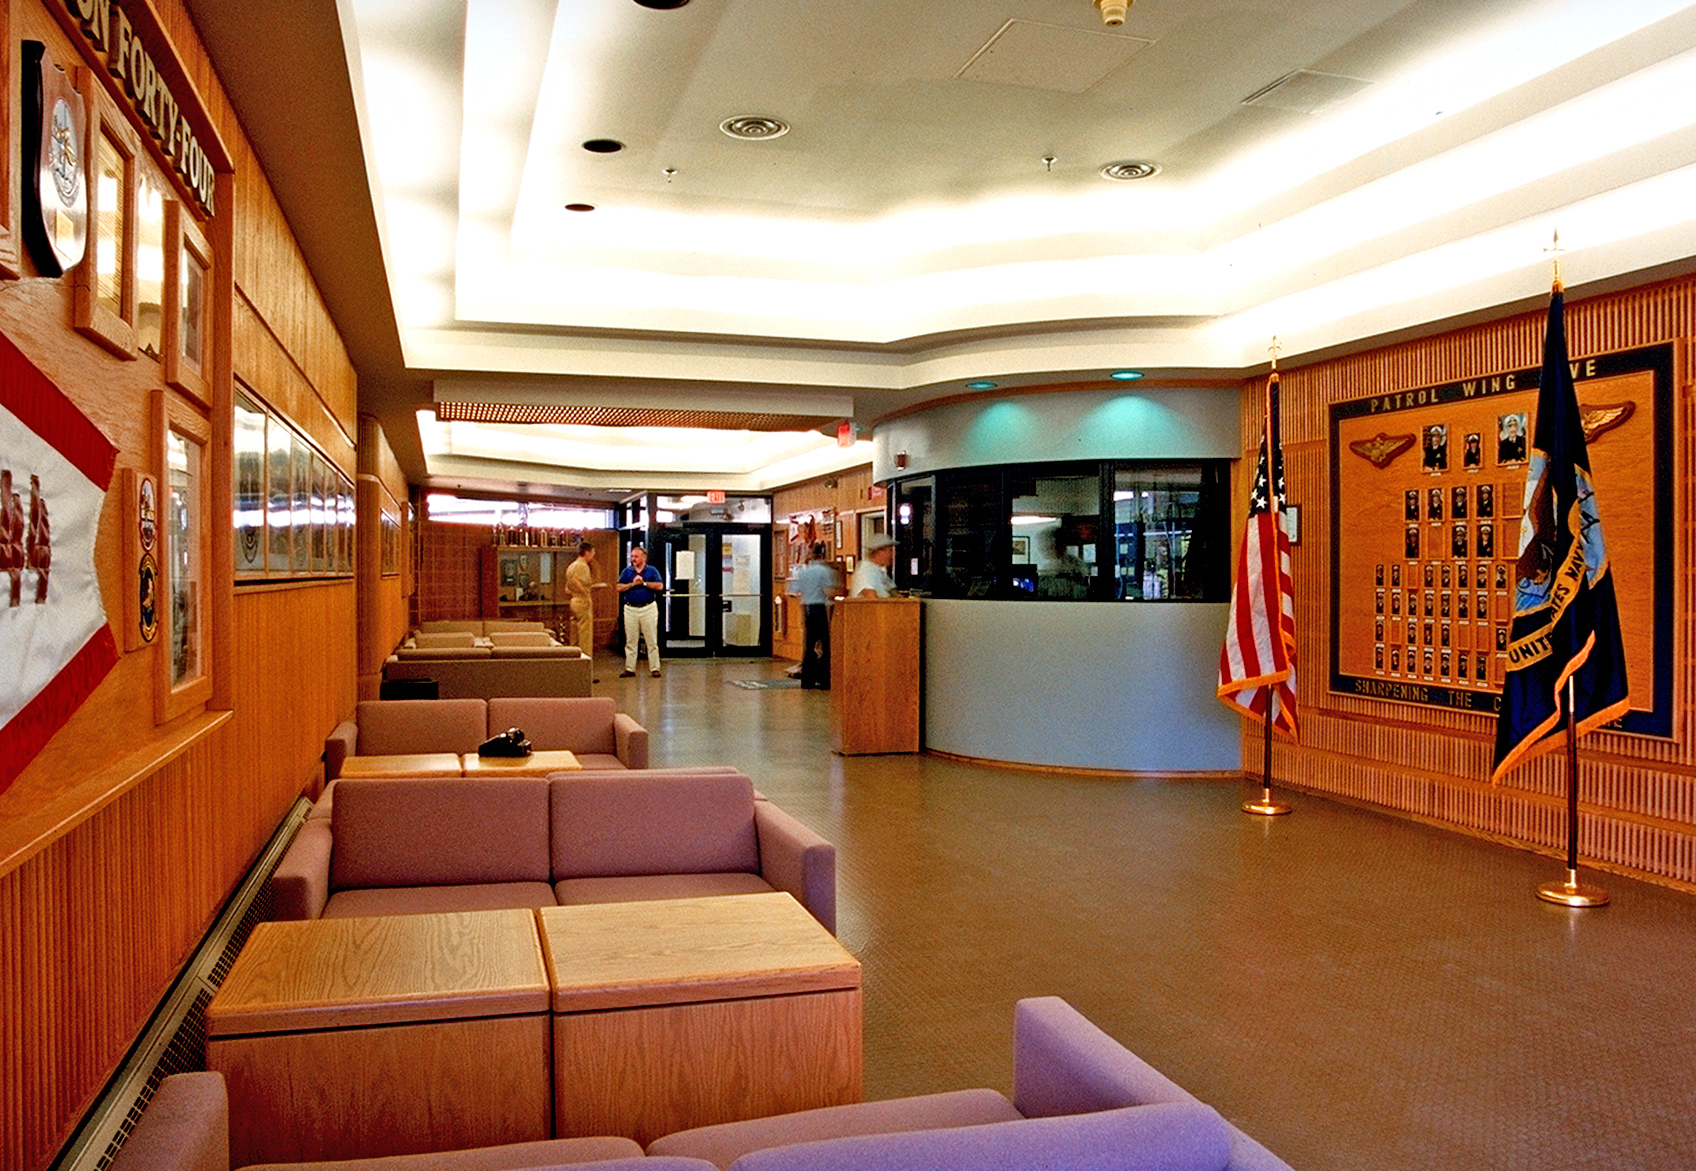 Photo of ASWOC interior for 40-year Retrospective